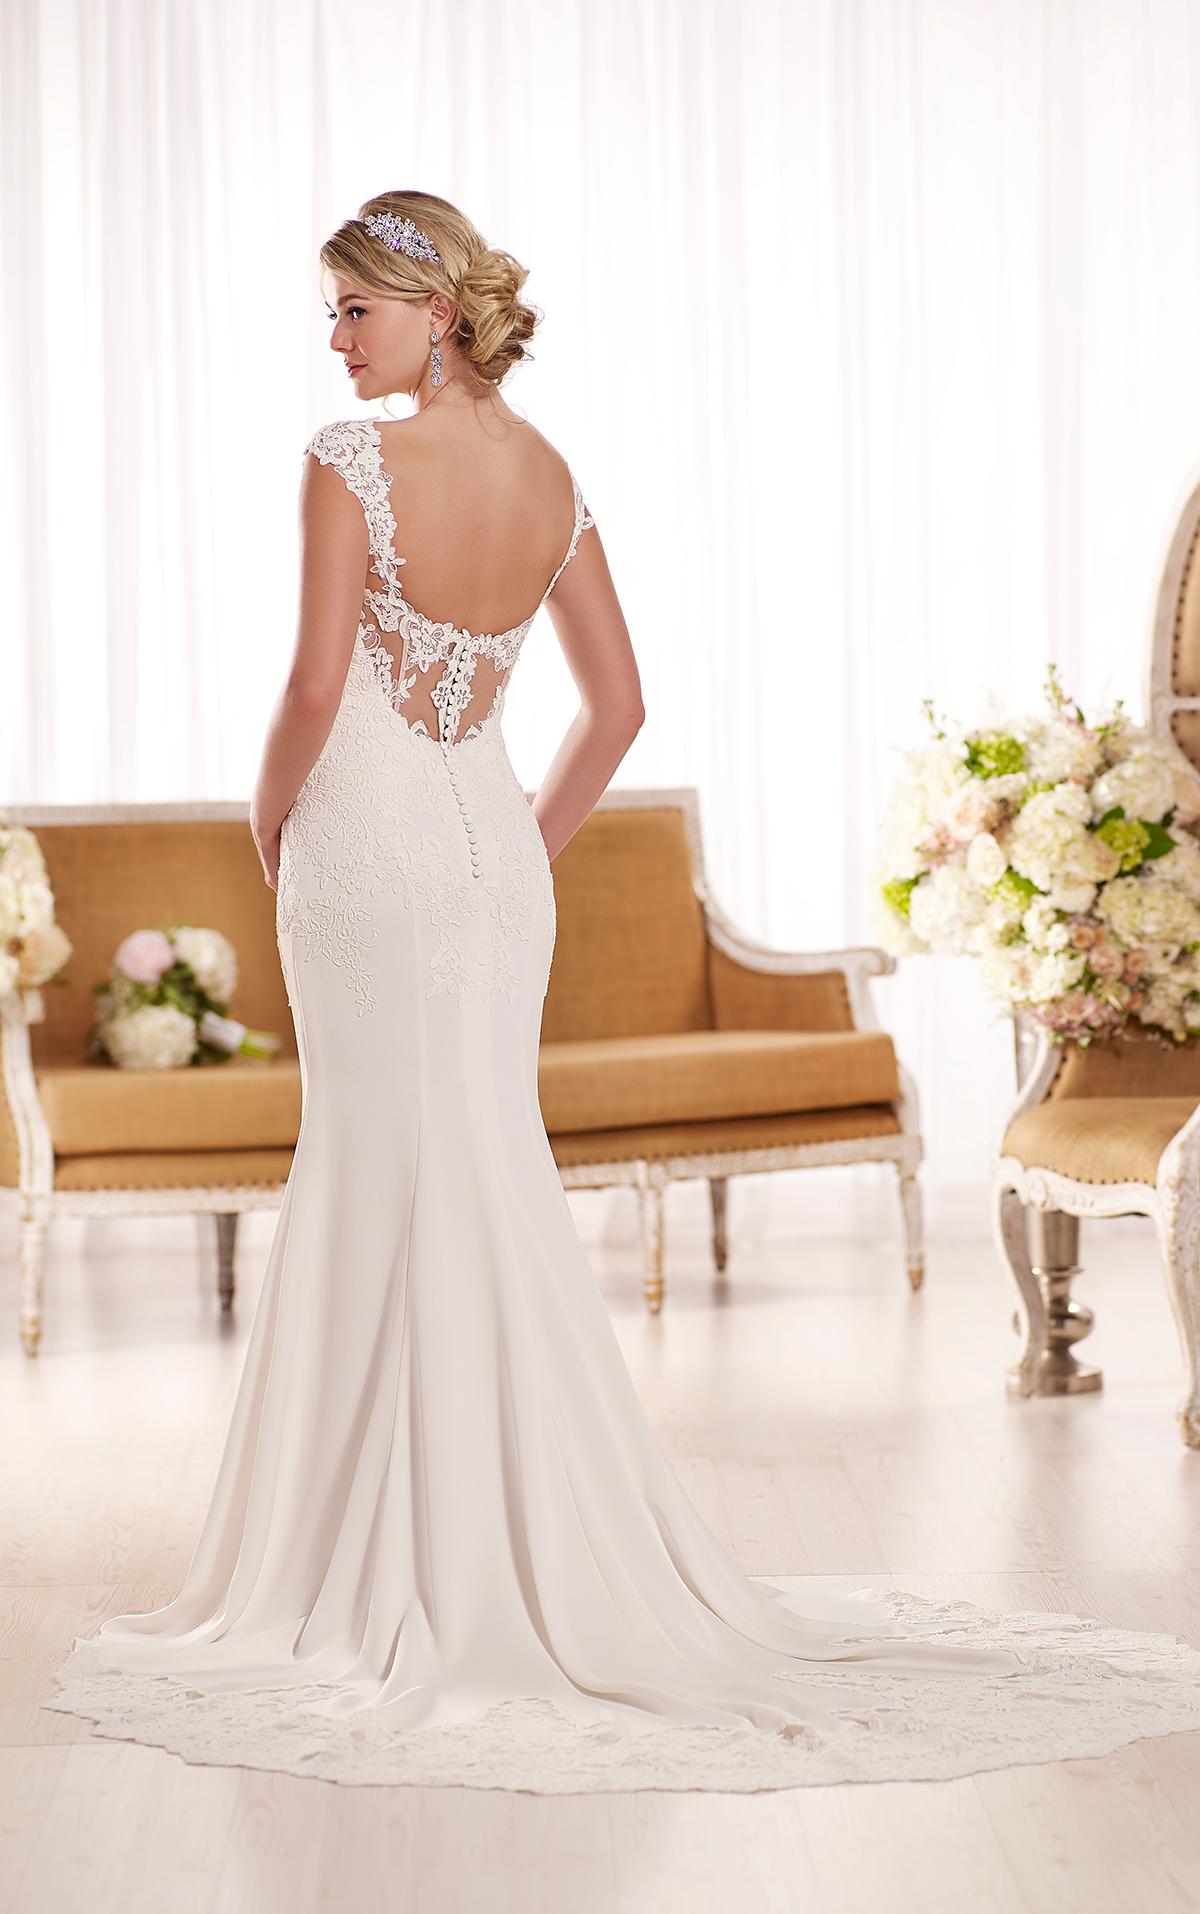 Essense d1897 fit and flare lace wedding dress 1299 for Essense of australia wedding dresses